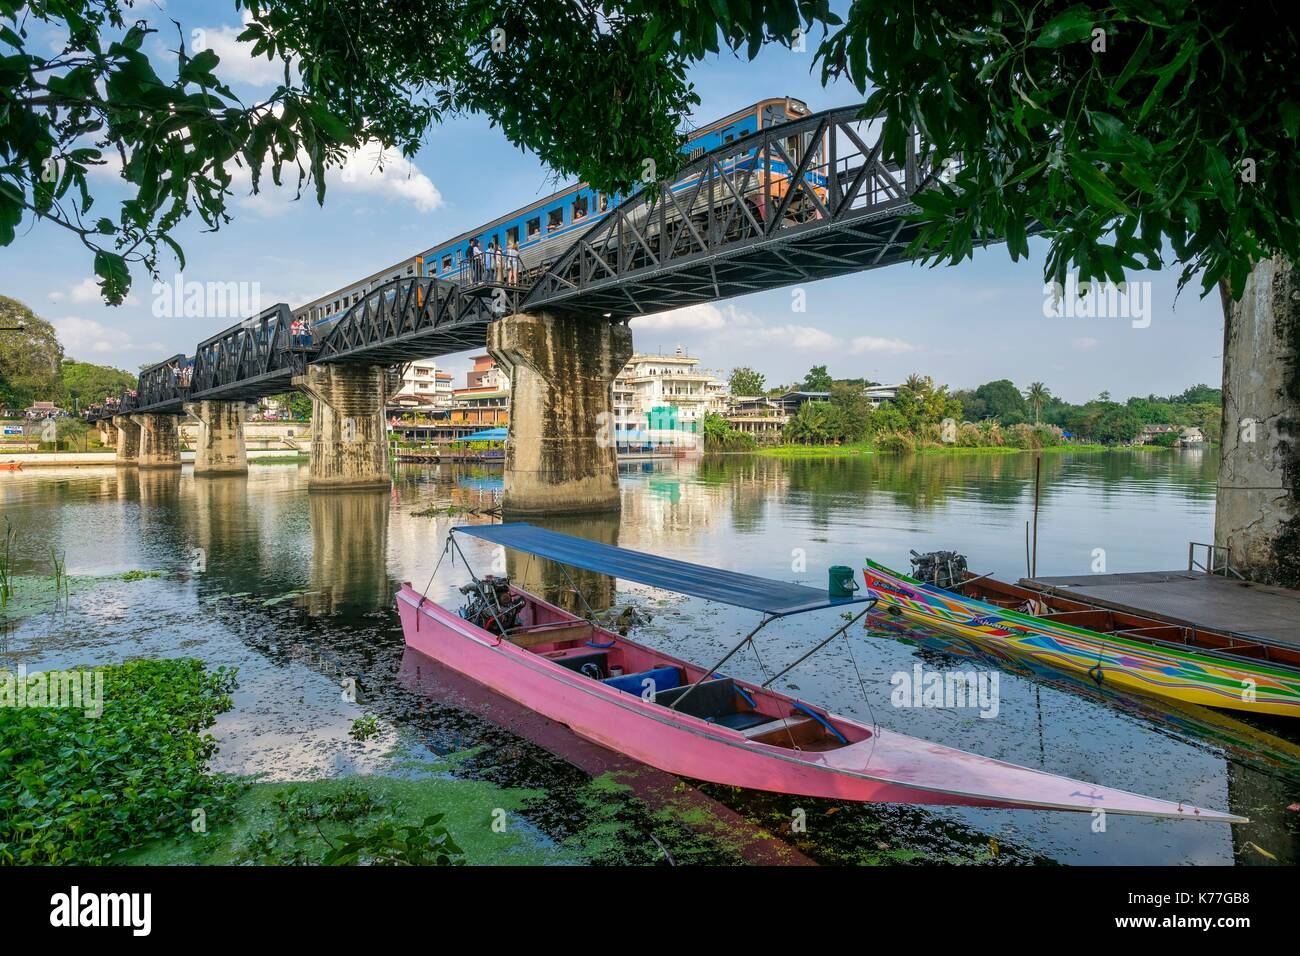 Thailand, Kanchanaburi province, Kanchanaburi, where the Khwae Noi and Khwae Yai Rivers converge, the Burma-Siam Railway or Death Railway, bridge over the Khwae river - Stock Image